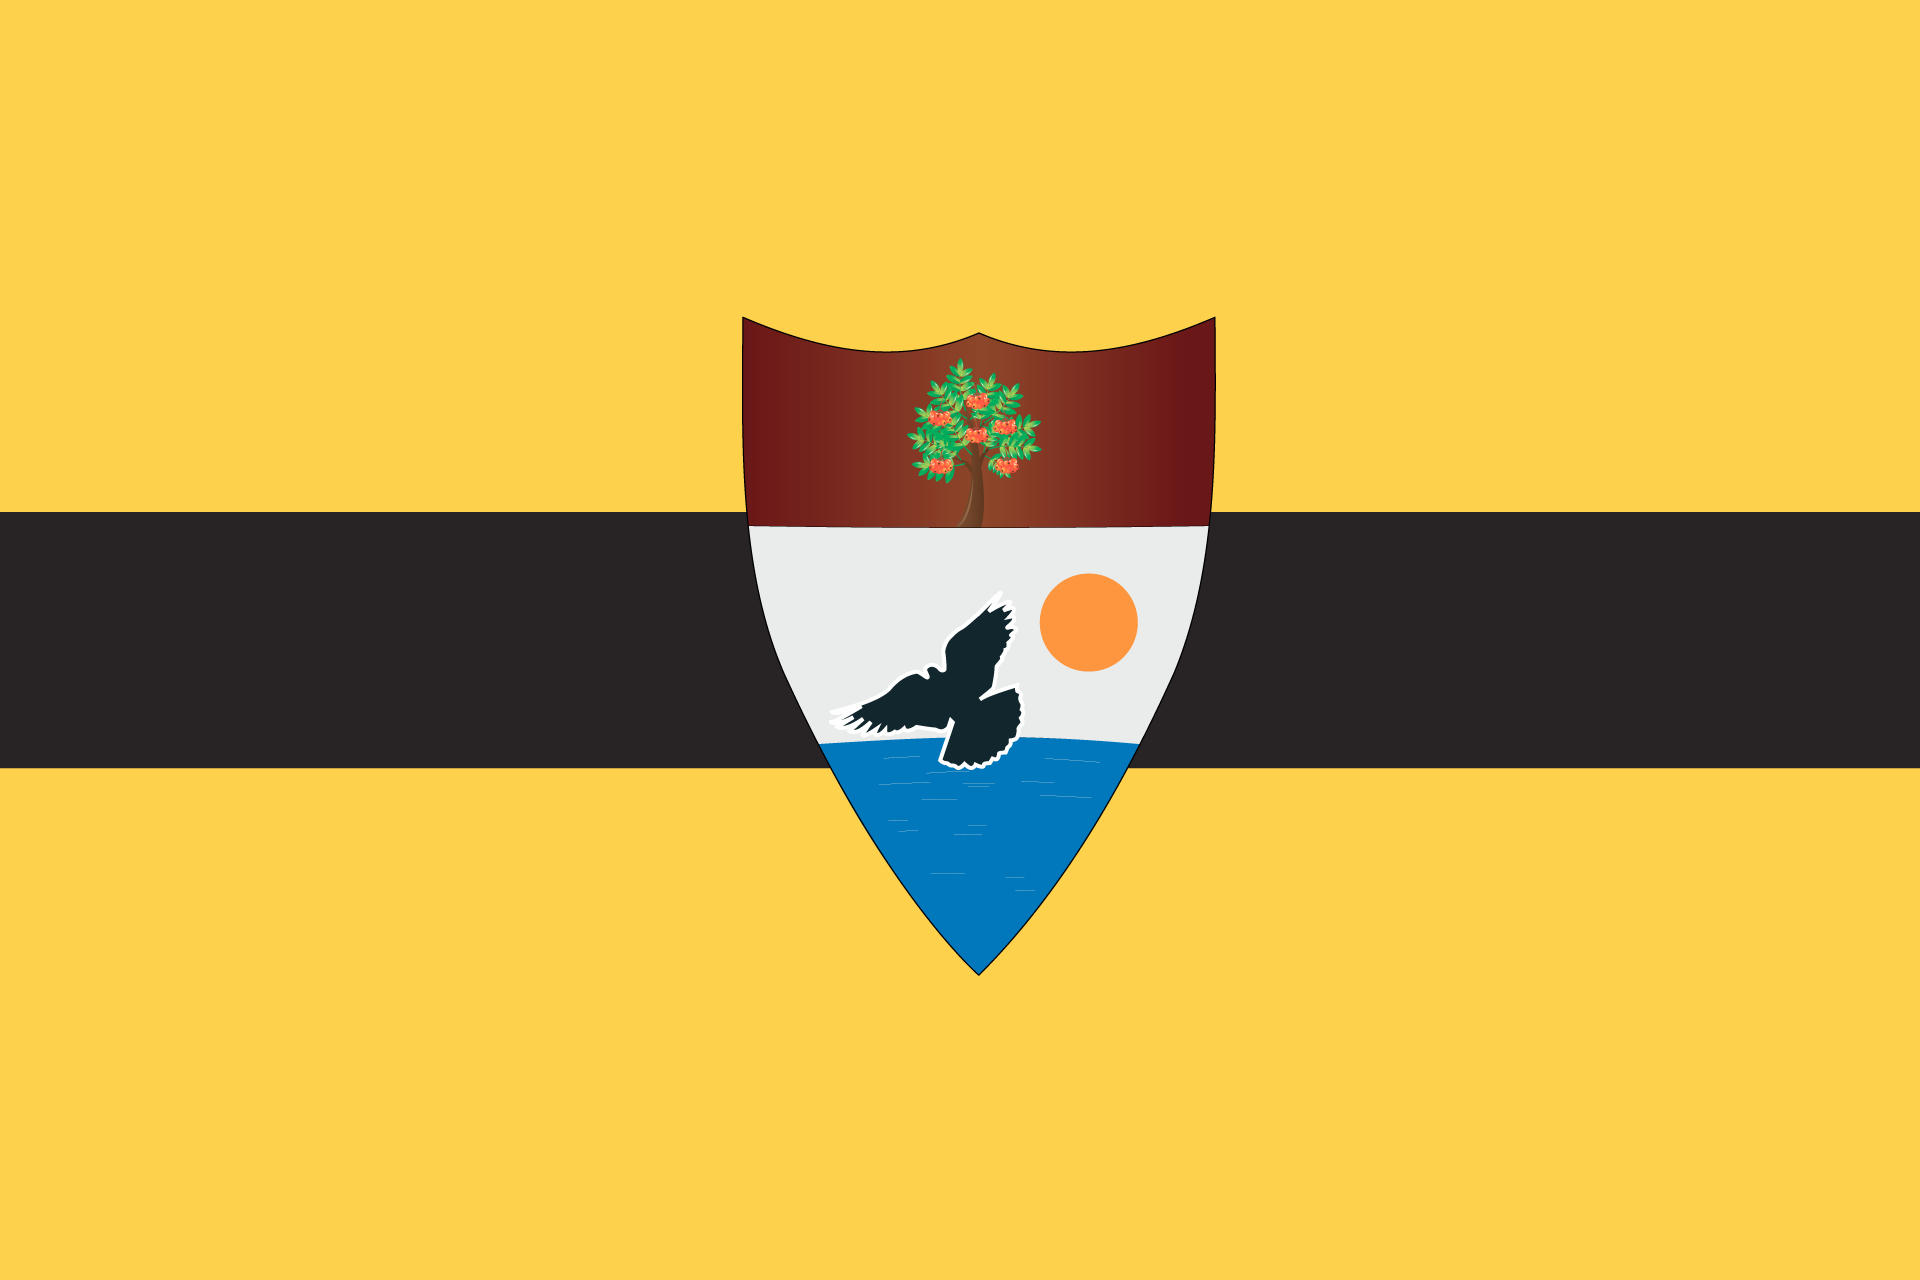 Plik:Liberland flag.png